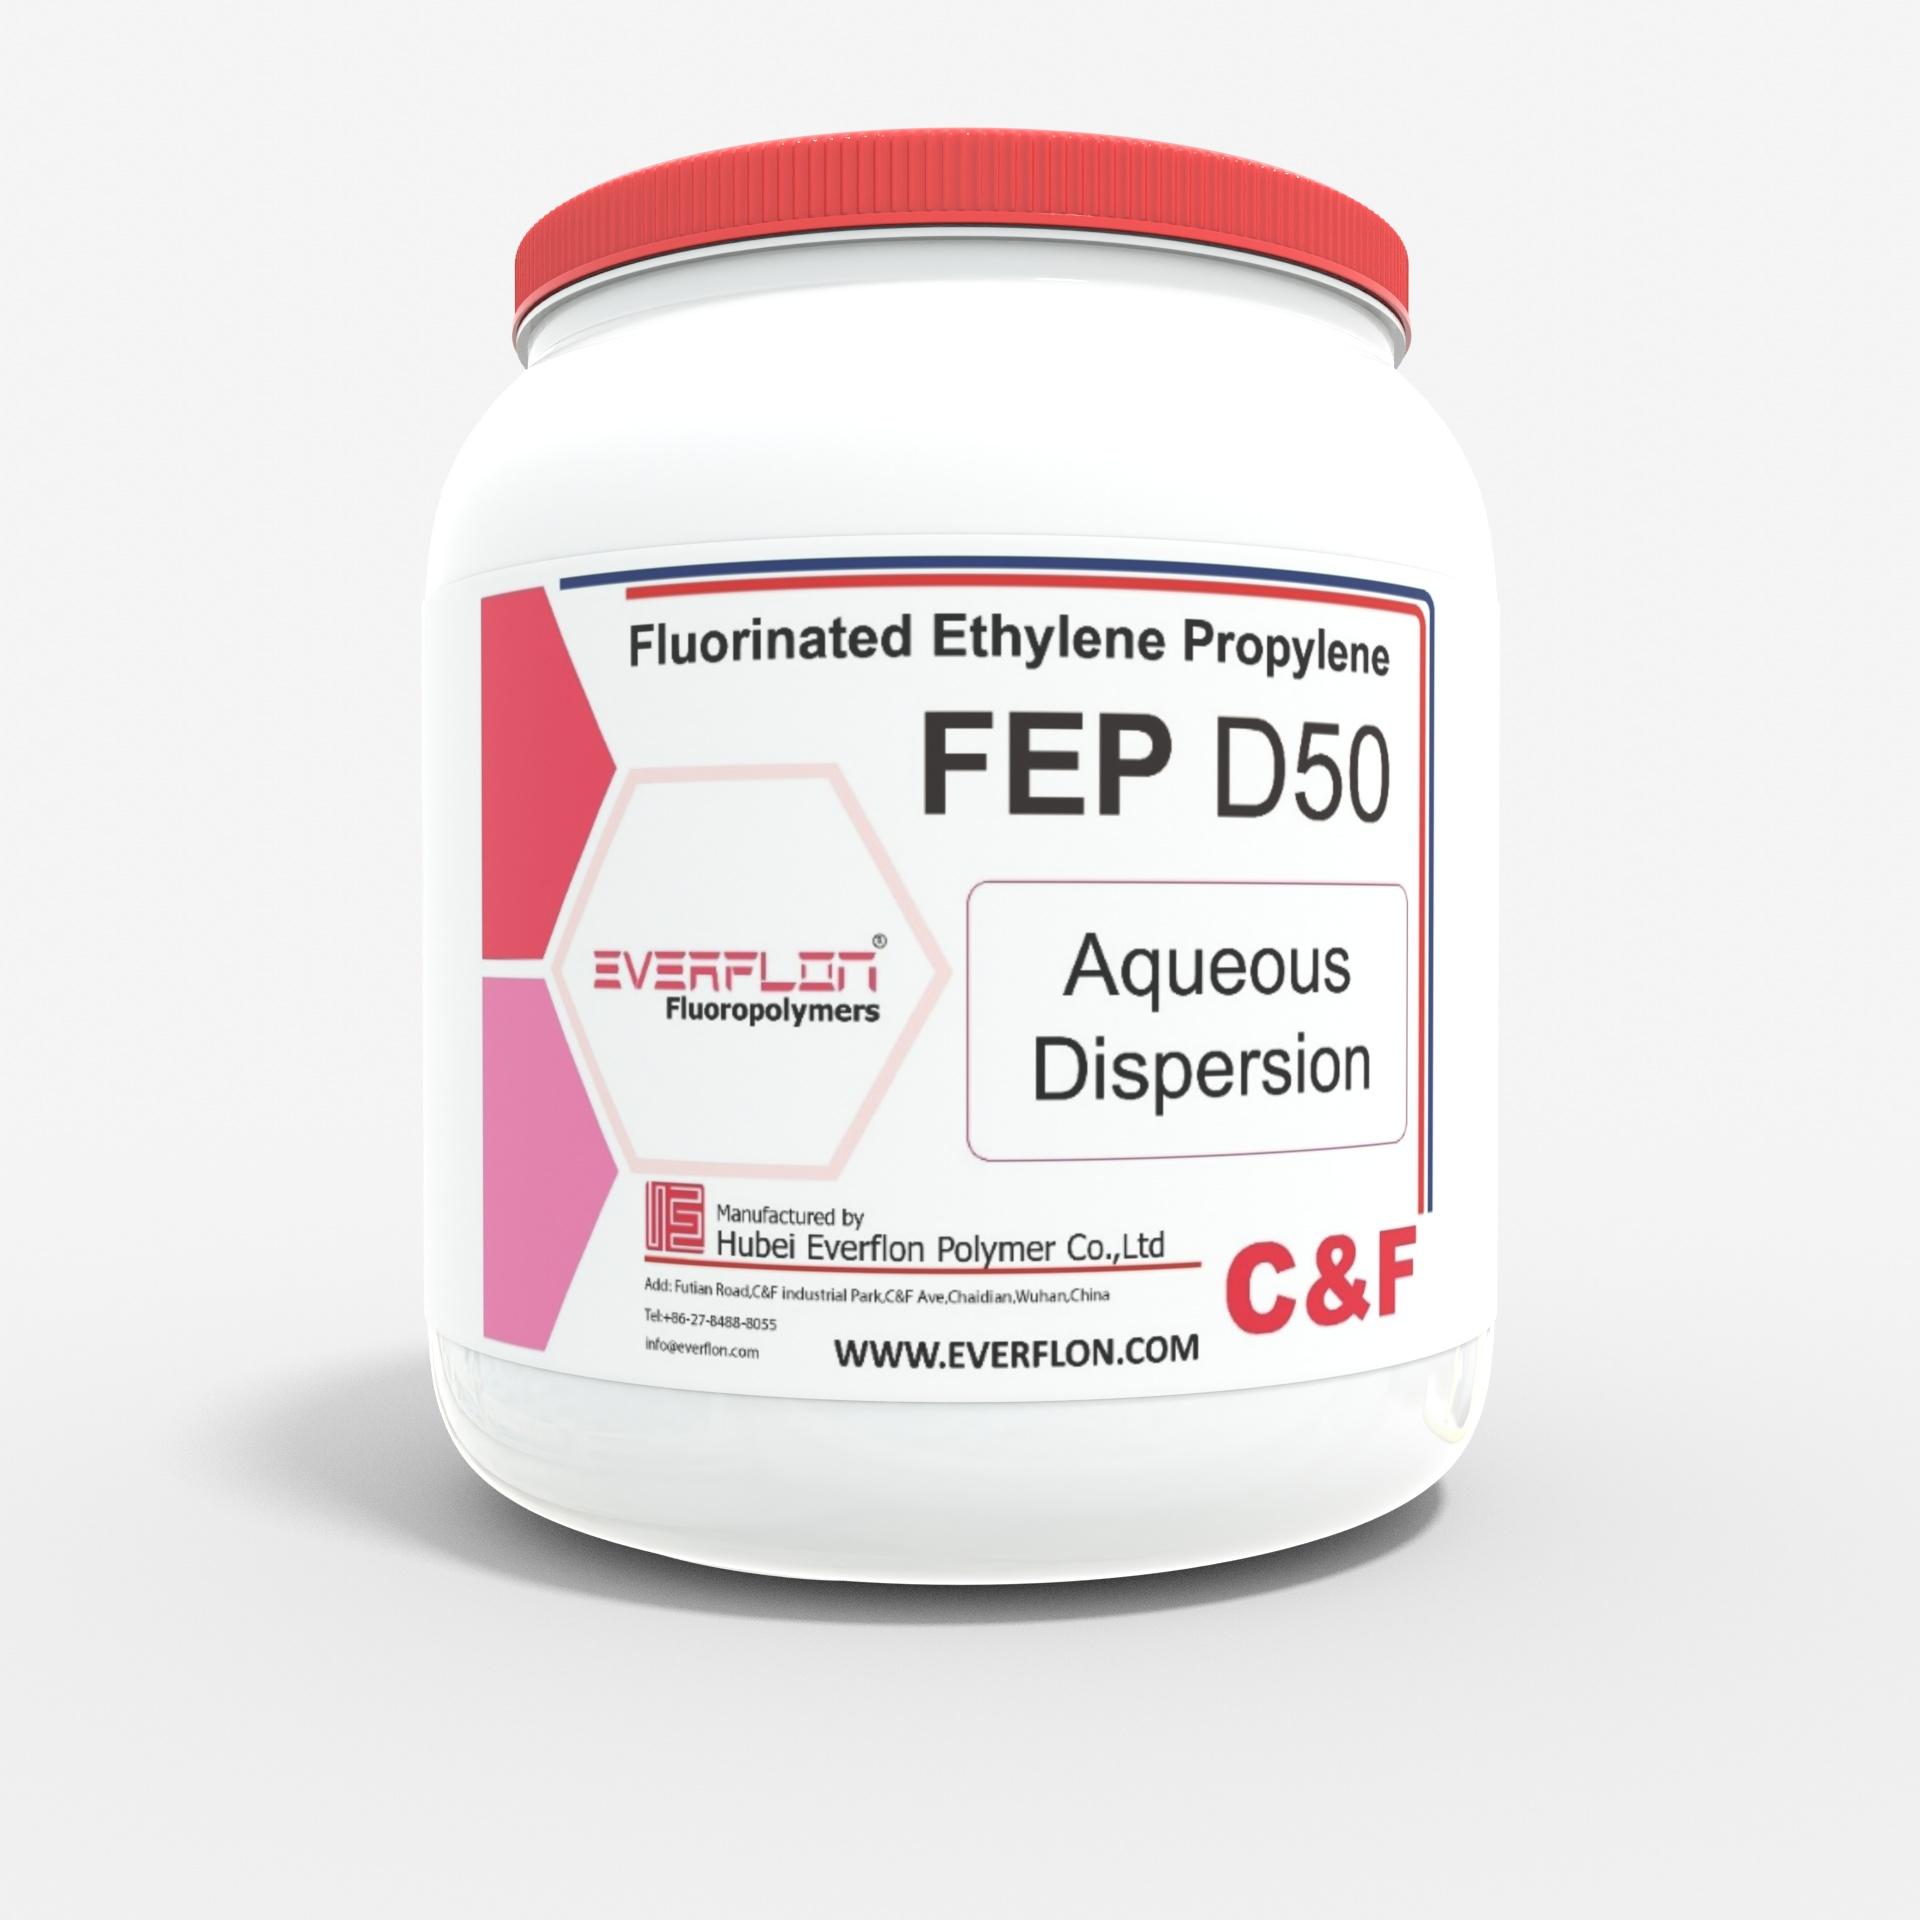 Everflon FEP Dispersion